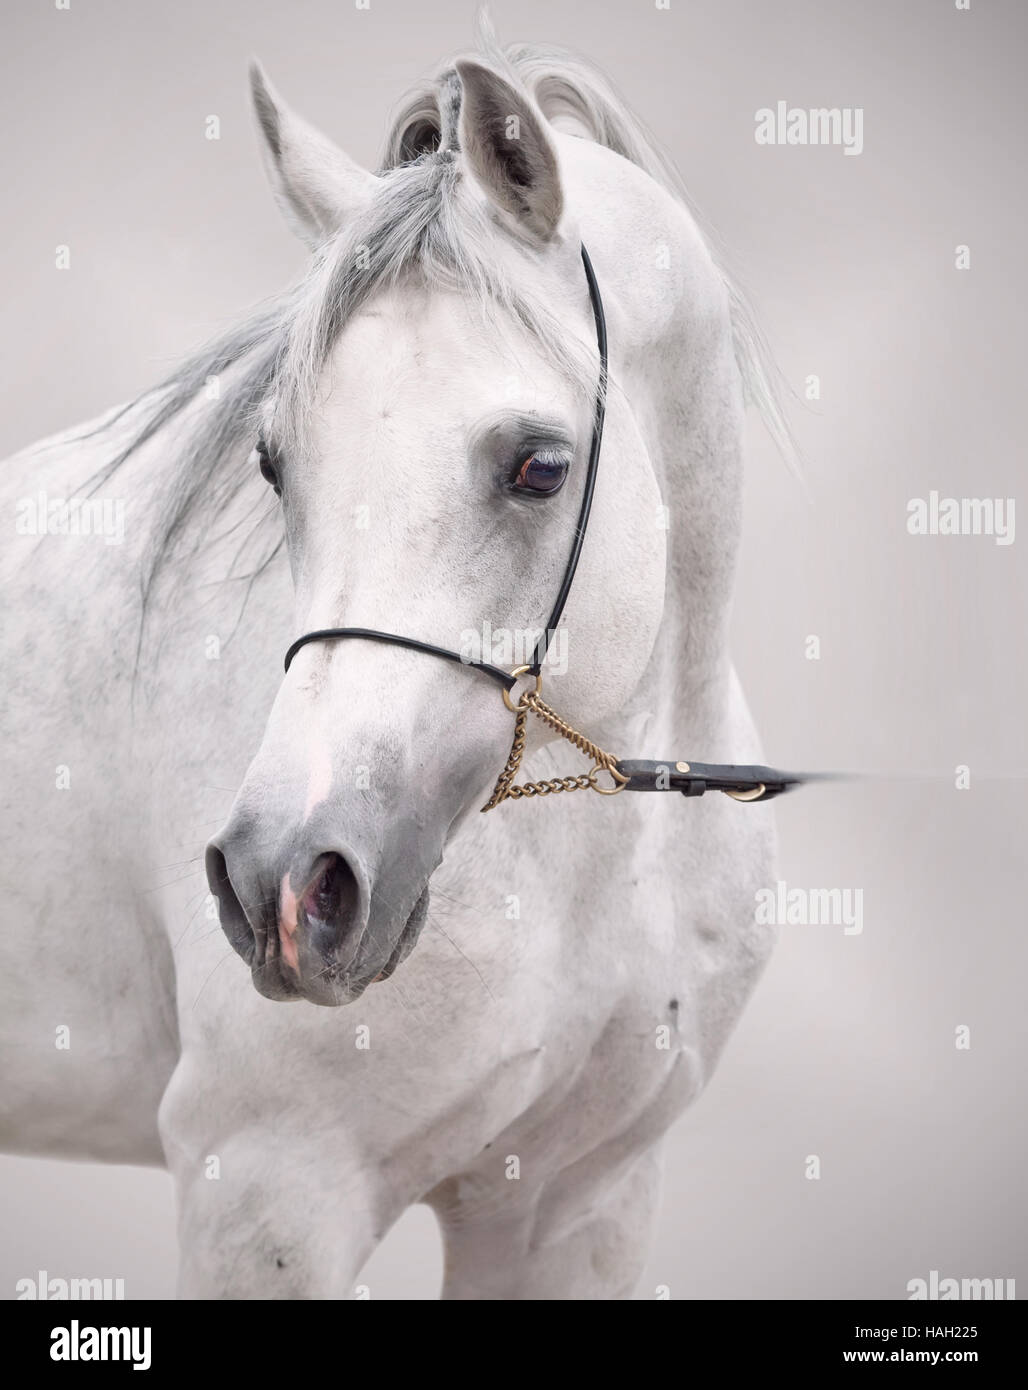 Retrato de Arabian Horse blanco en fondo gris. Imagen De Stock